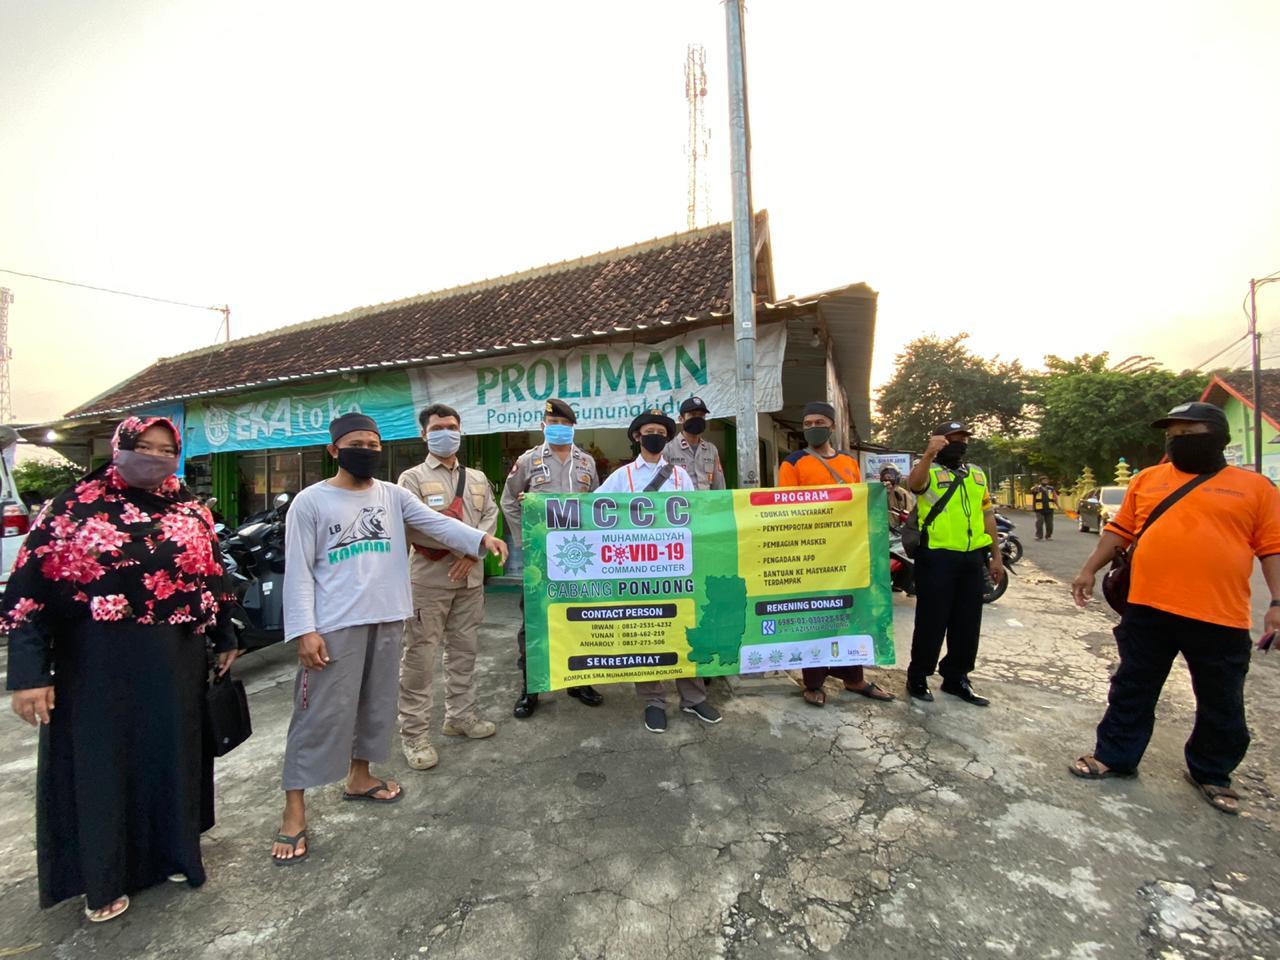 MCCC Cabang Ponjong berbagi Masker Gratis di Proliman